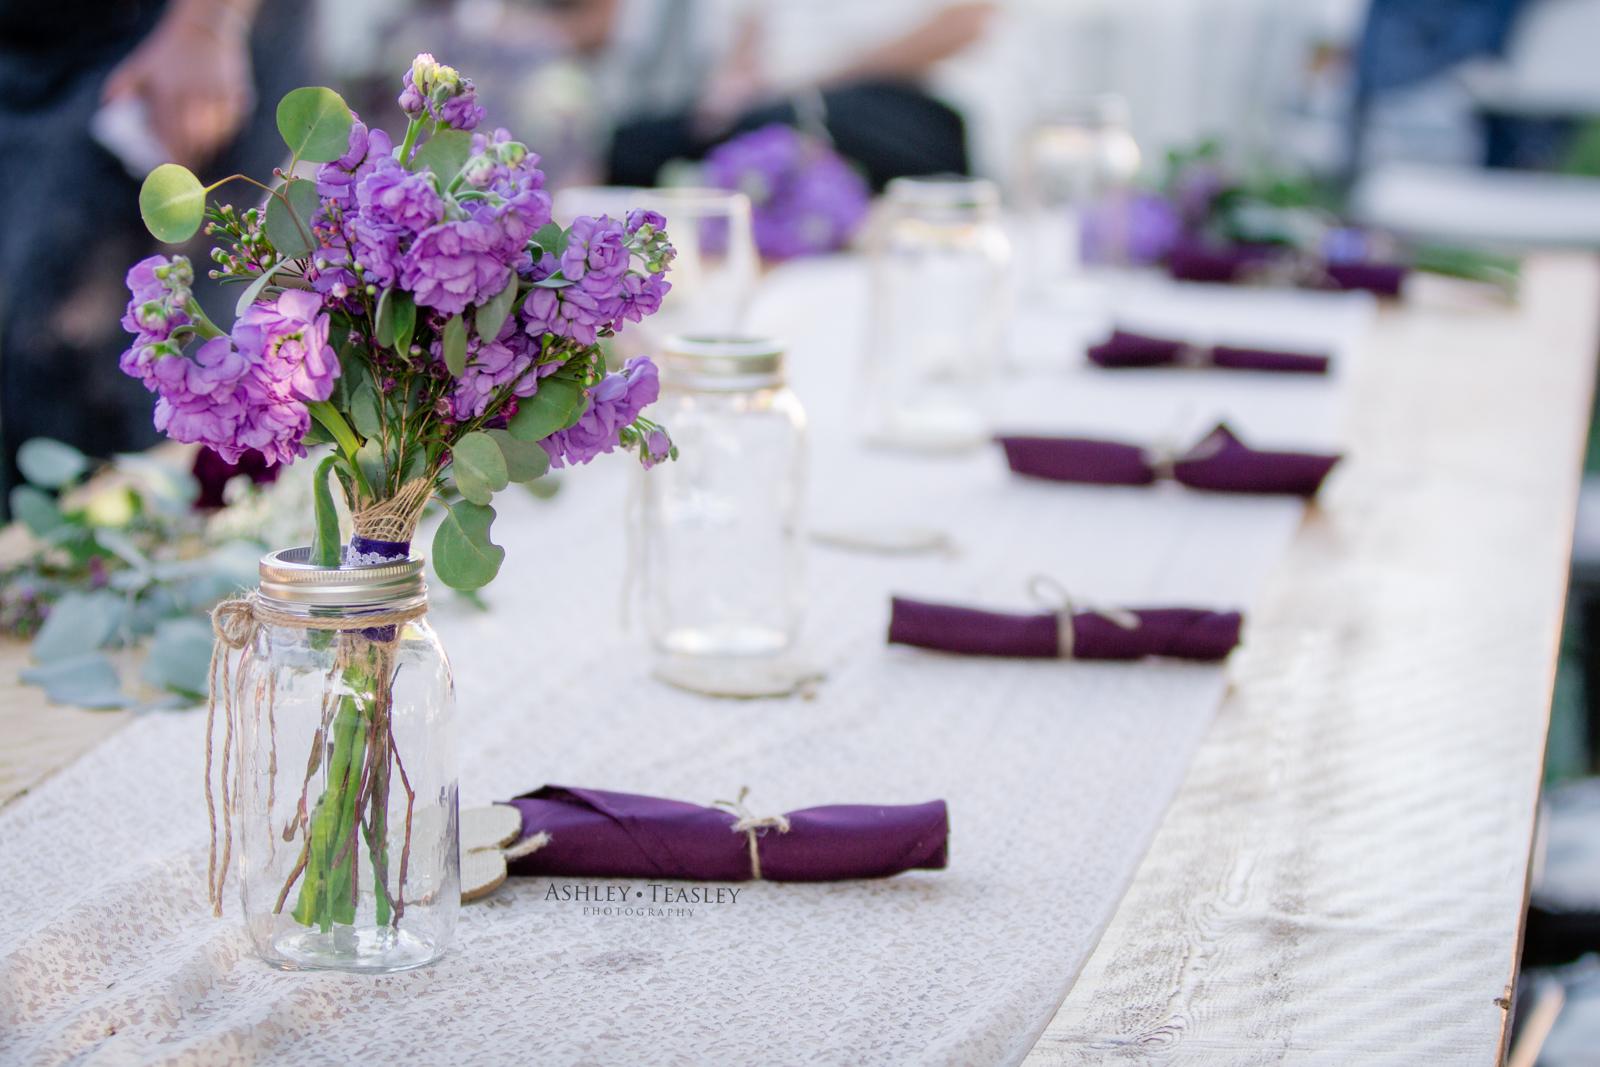 Ashley Teasley Photography - Amador Cellars Winery - Sacramento Wedding Photographer-121.JPG